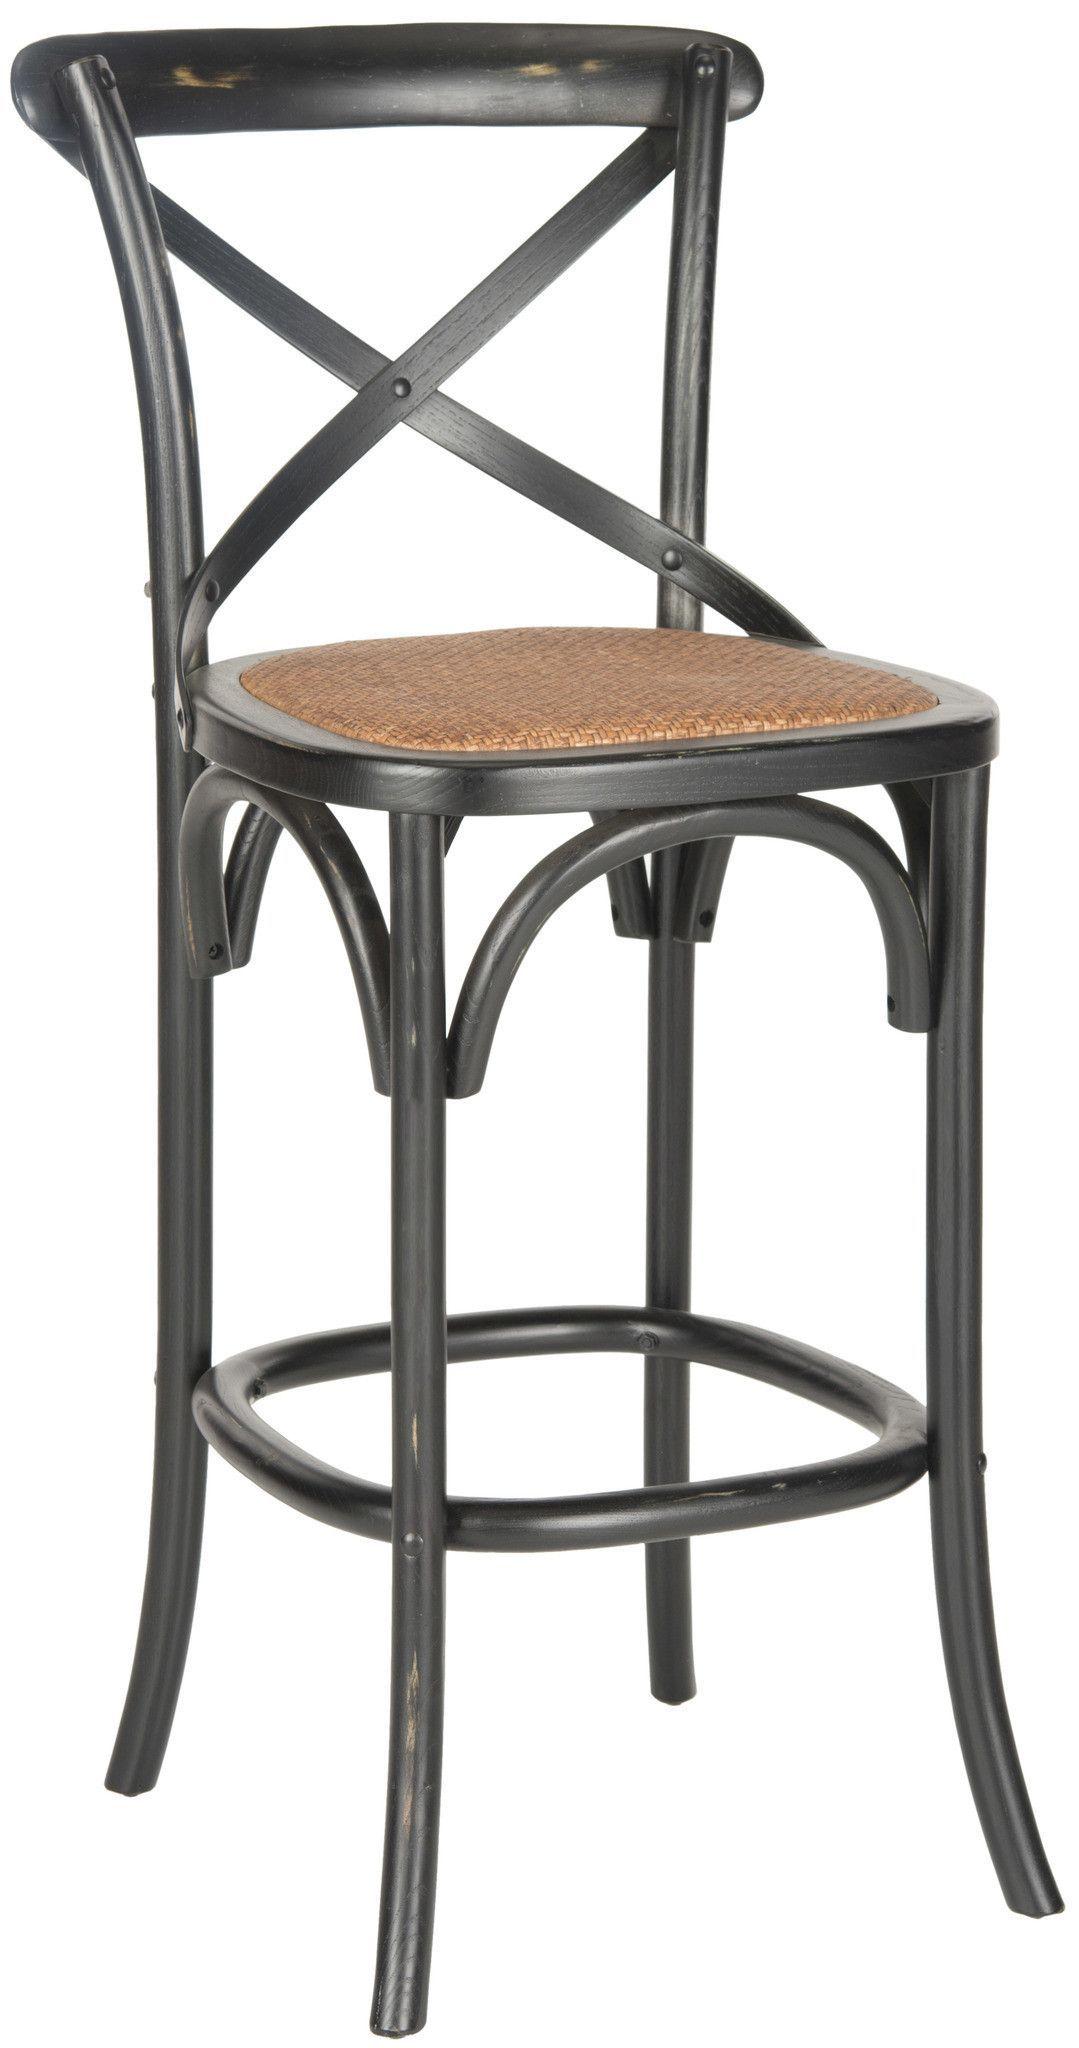 Phenomenal Safavieh Franklin X Back Barstool Decorate Oak Bar Lamtechconsult Wood Chair Design Ideas Lamtechconsultcom